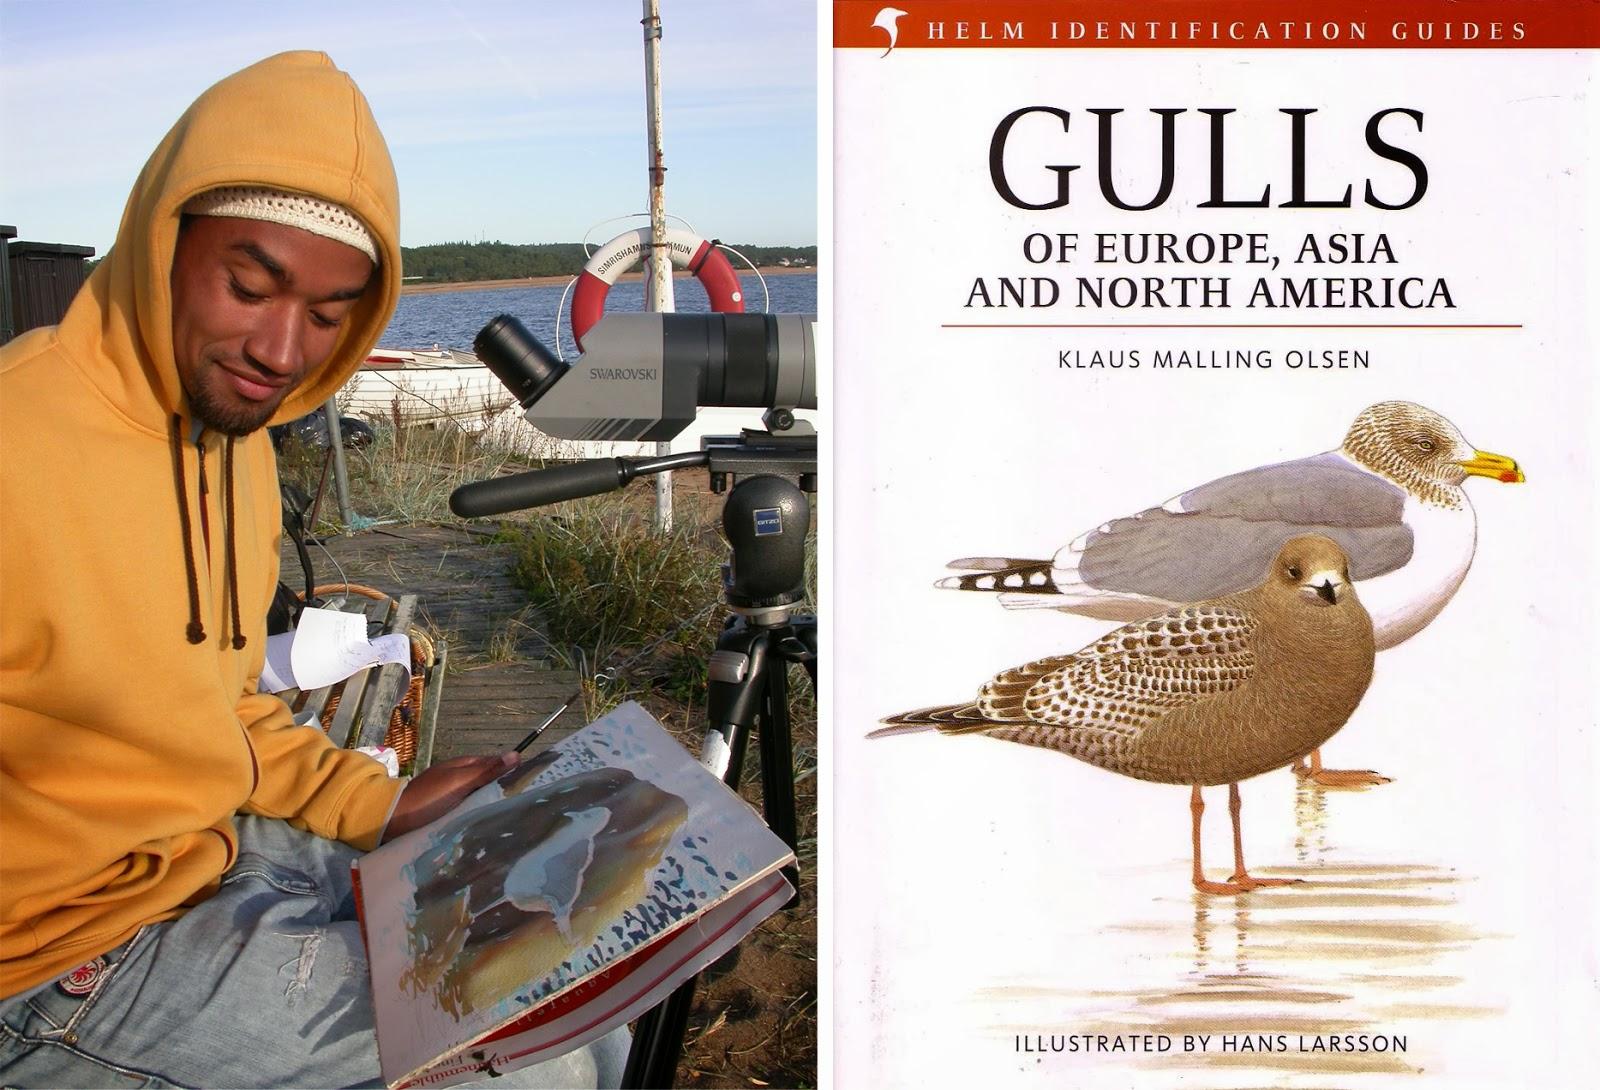 Hans Larsson painting Gulls.jpg